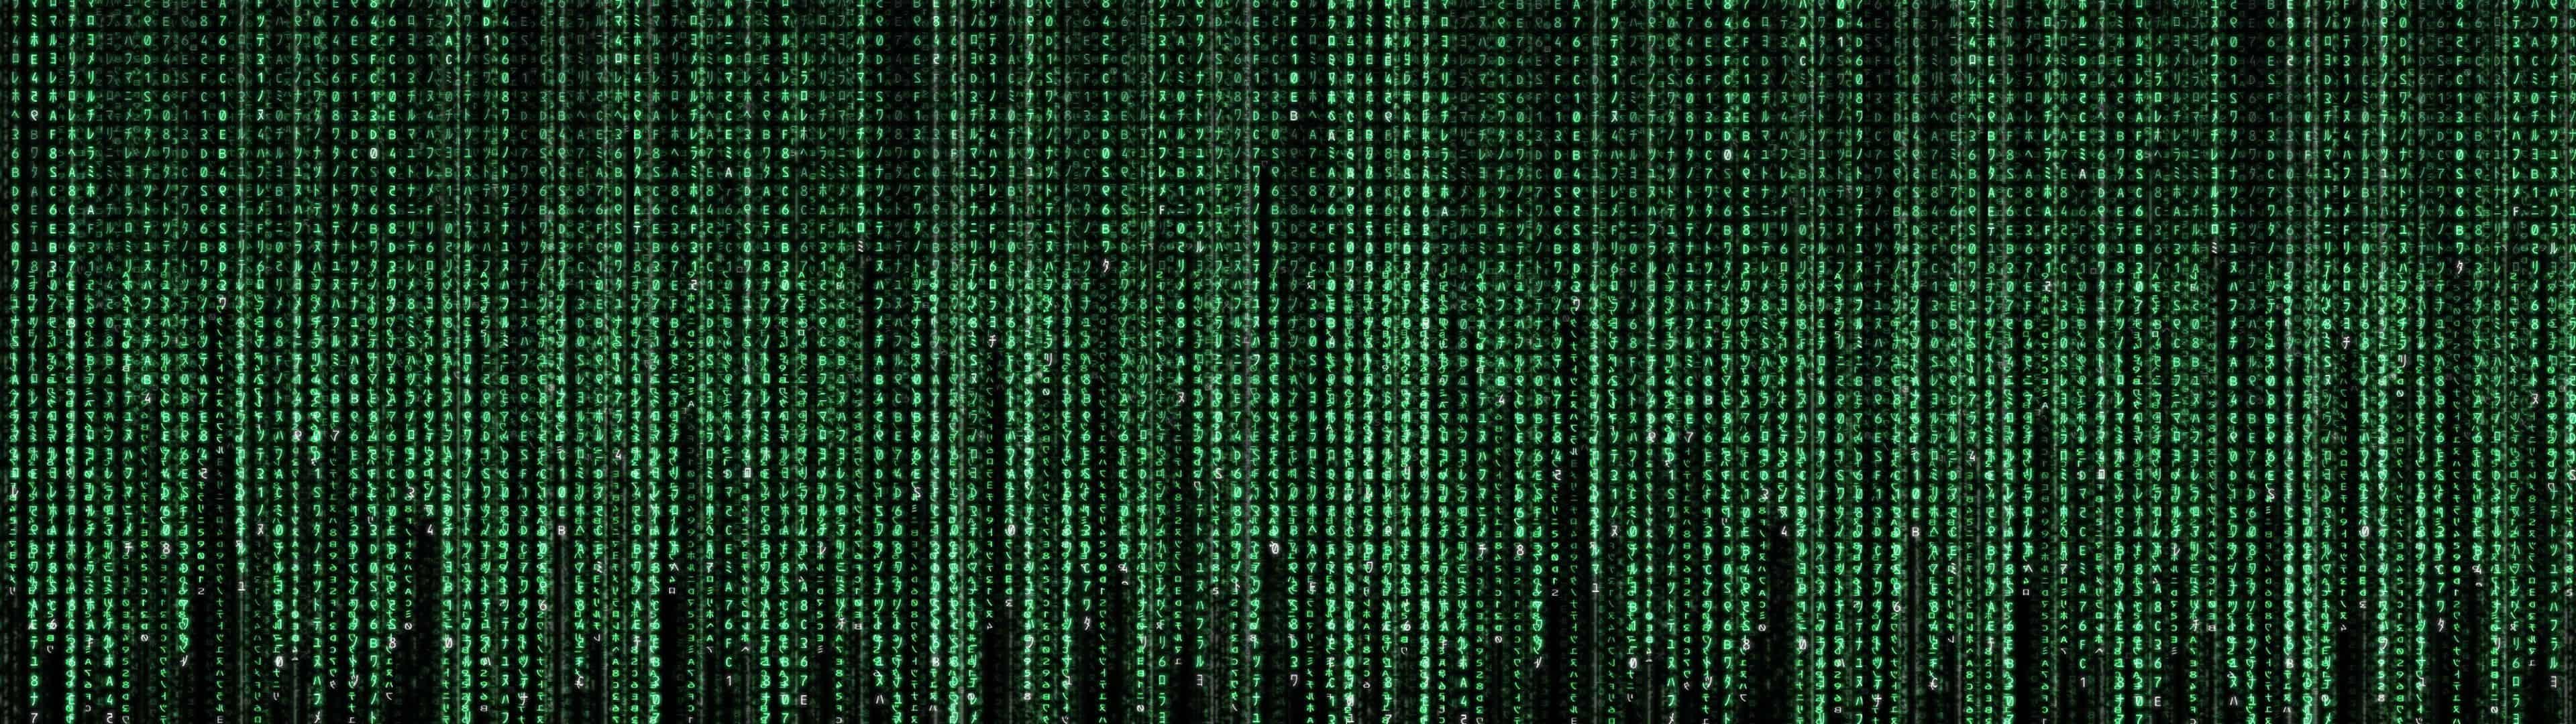 the matrix code dual monitor wallpaper